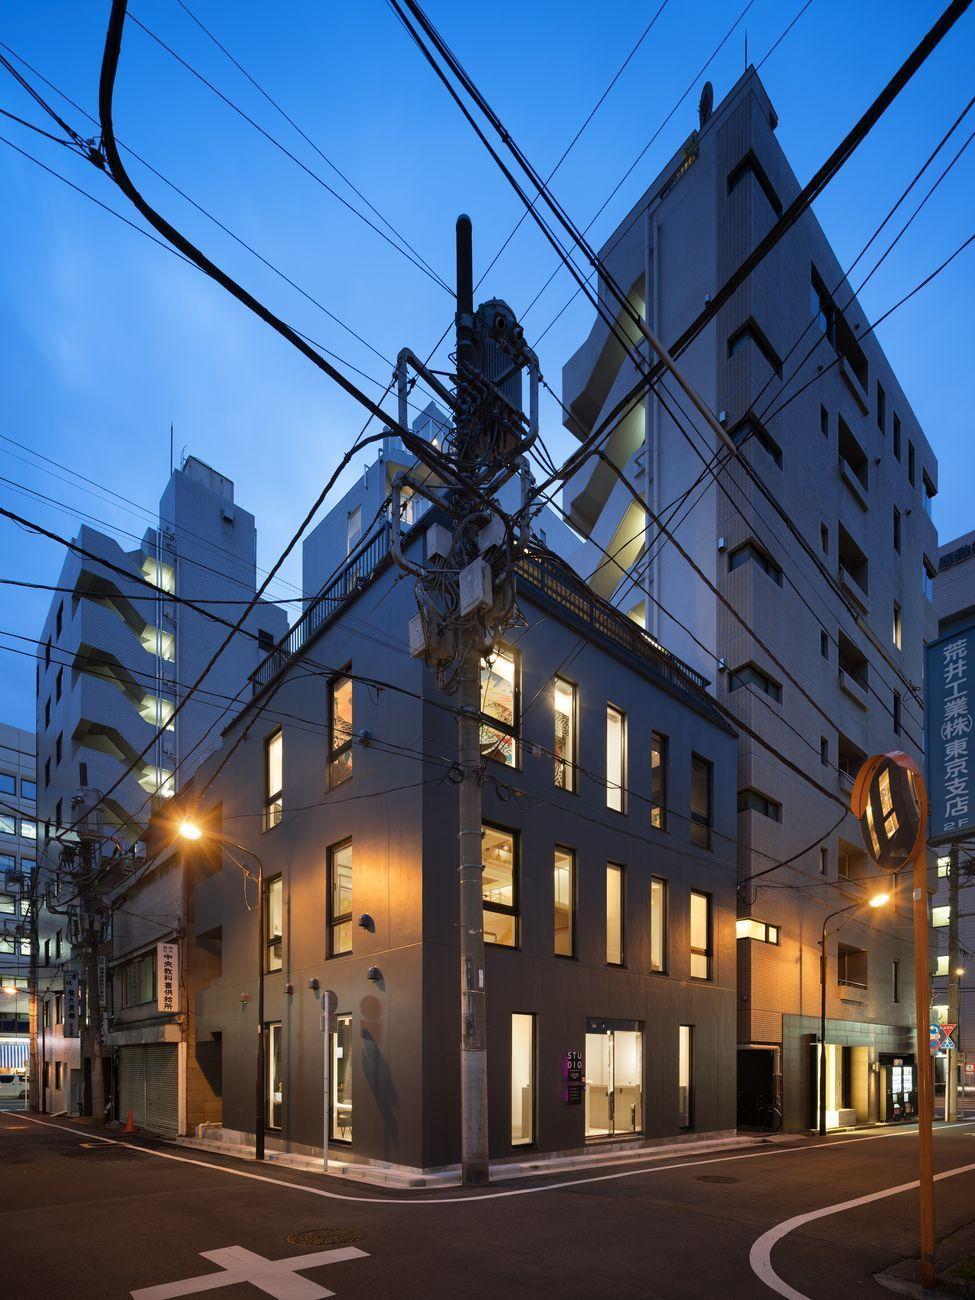 Artist Hotel – BnA Studio Akihabara. Photo Tomooki Kengaku